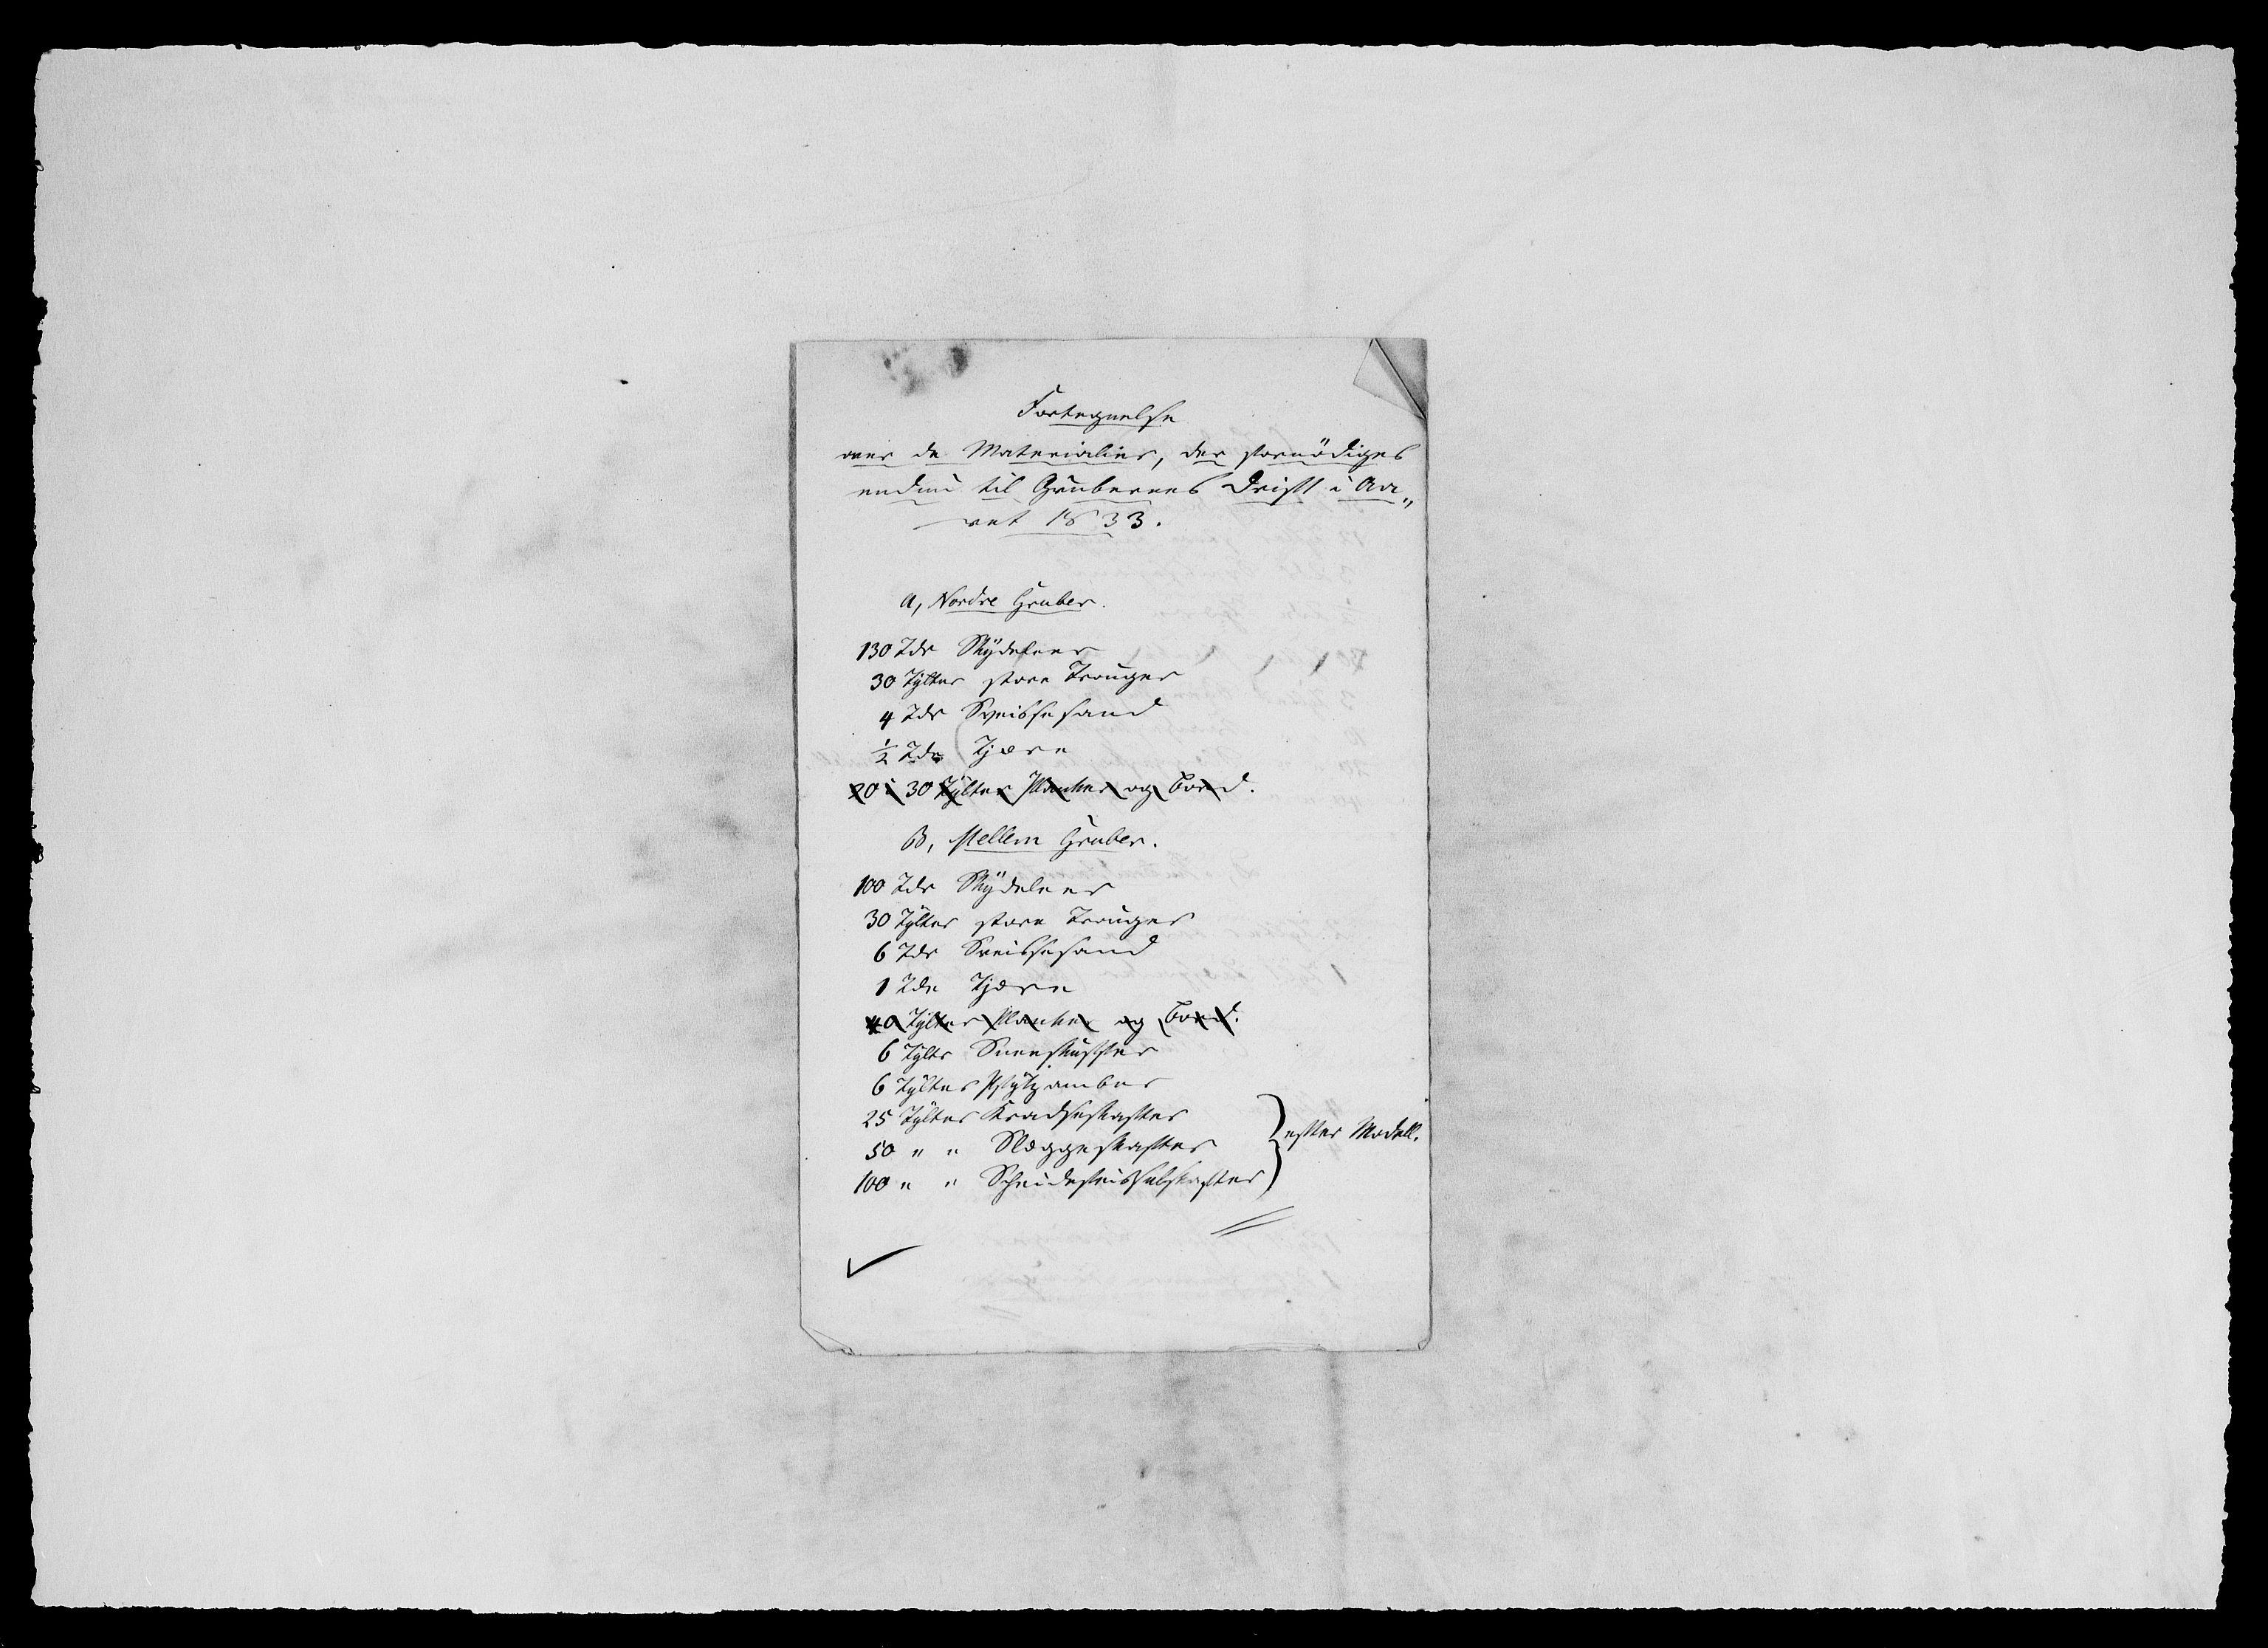 RA, Modums Blaafarveværk, G/Ga/L0063, 1827-1849, s. 200